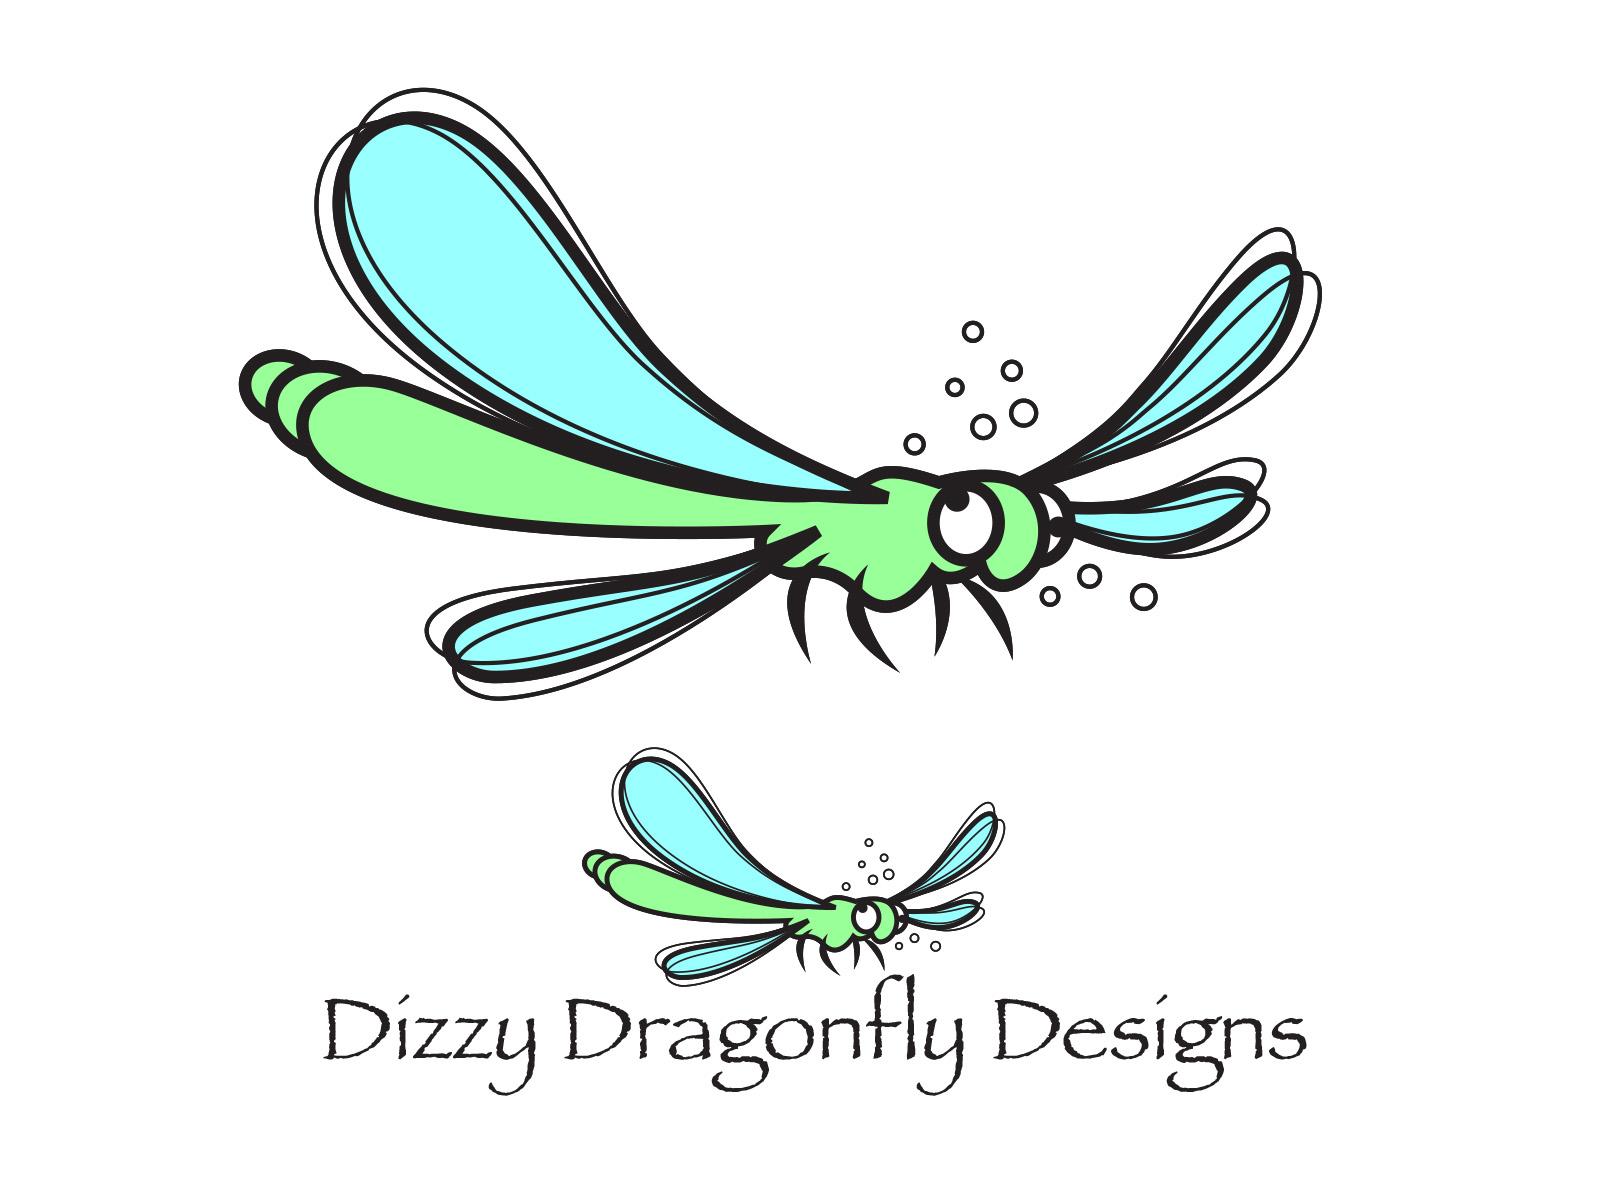 Dizzy Dragonfly Designs